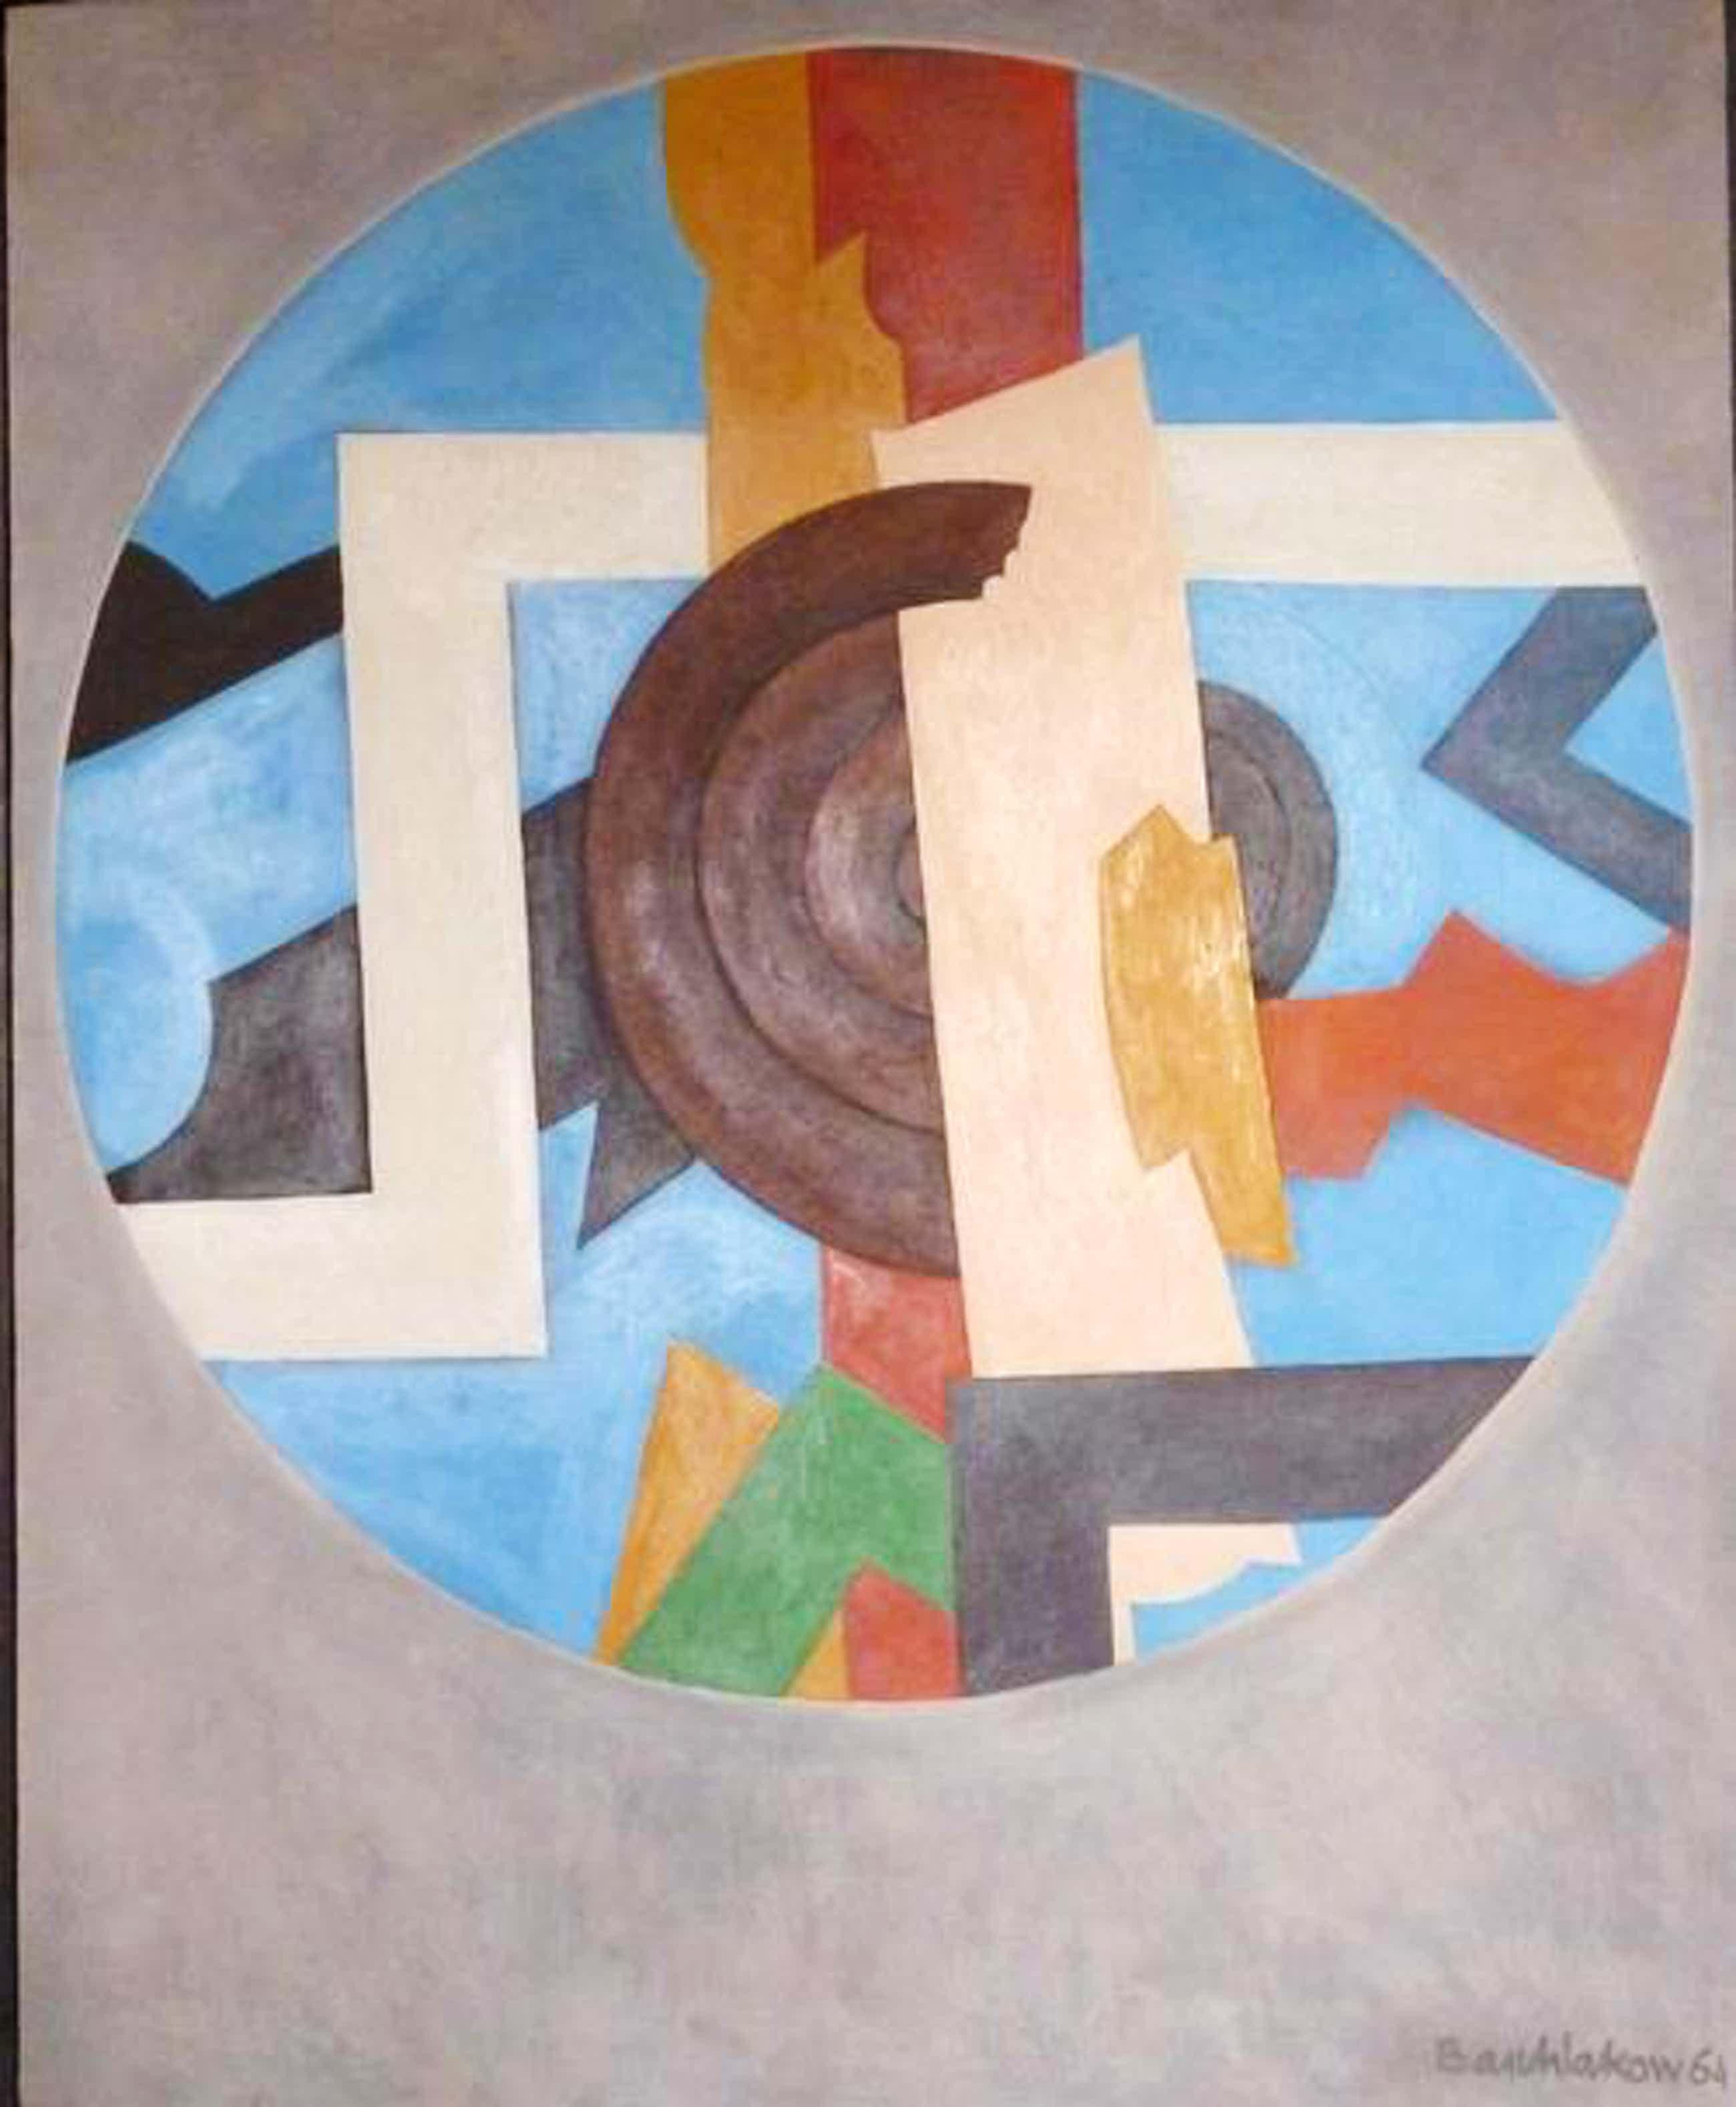 Alexej Illjitsch Baschlakow - Durchscha, Öl auf Holz, 1964 kopen? Bied vanaf 2250!